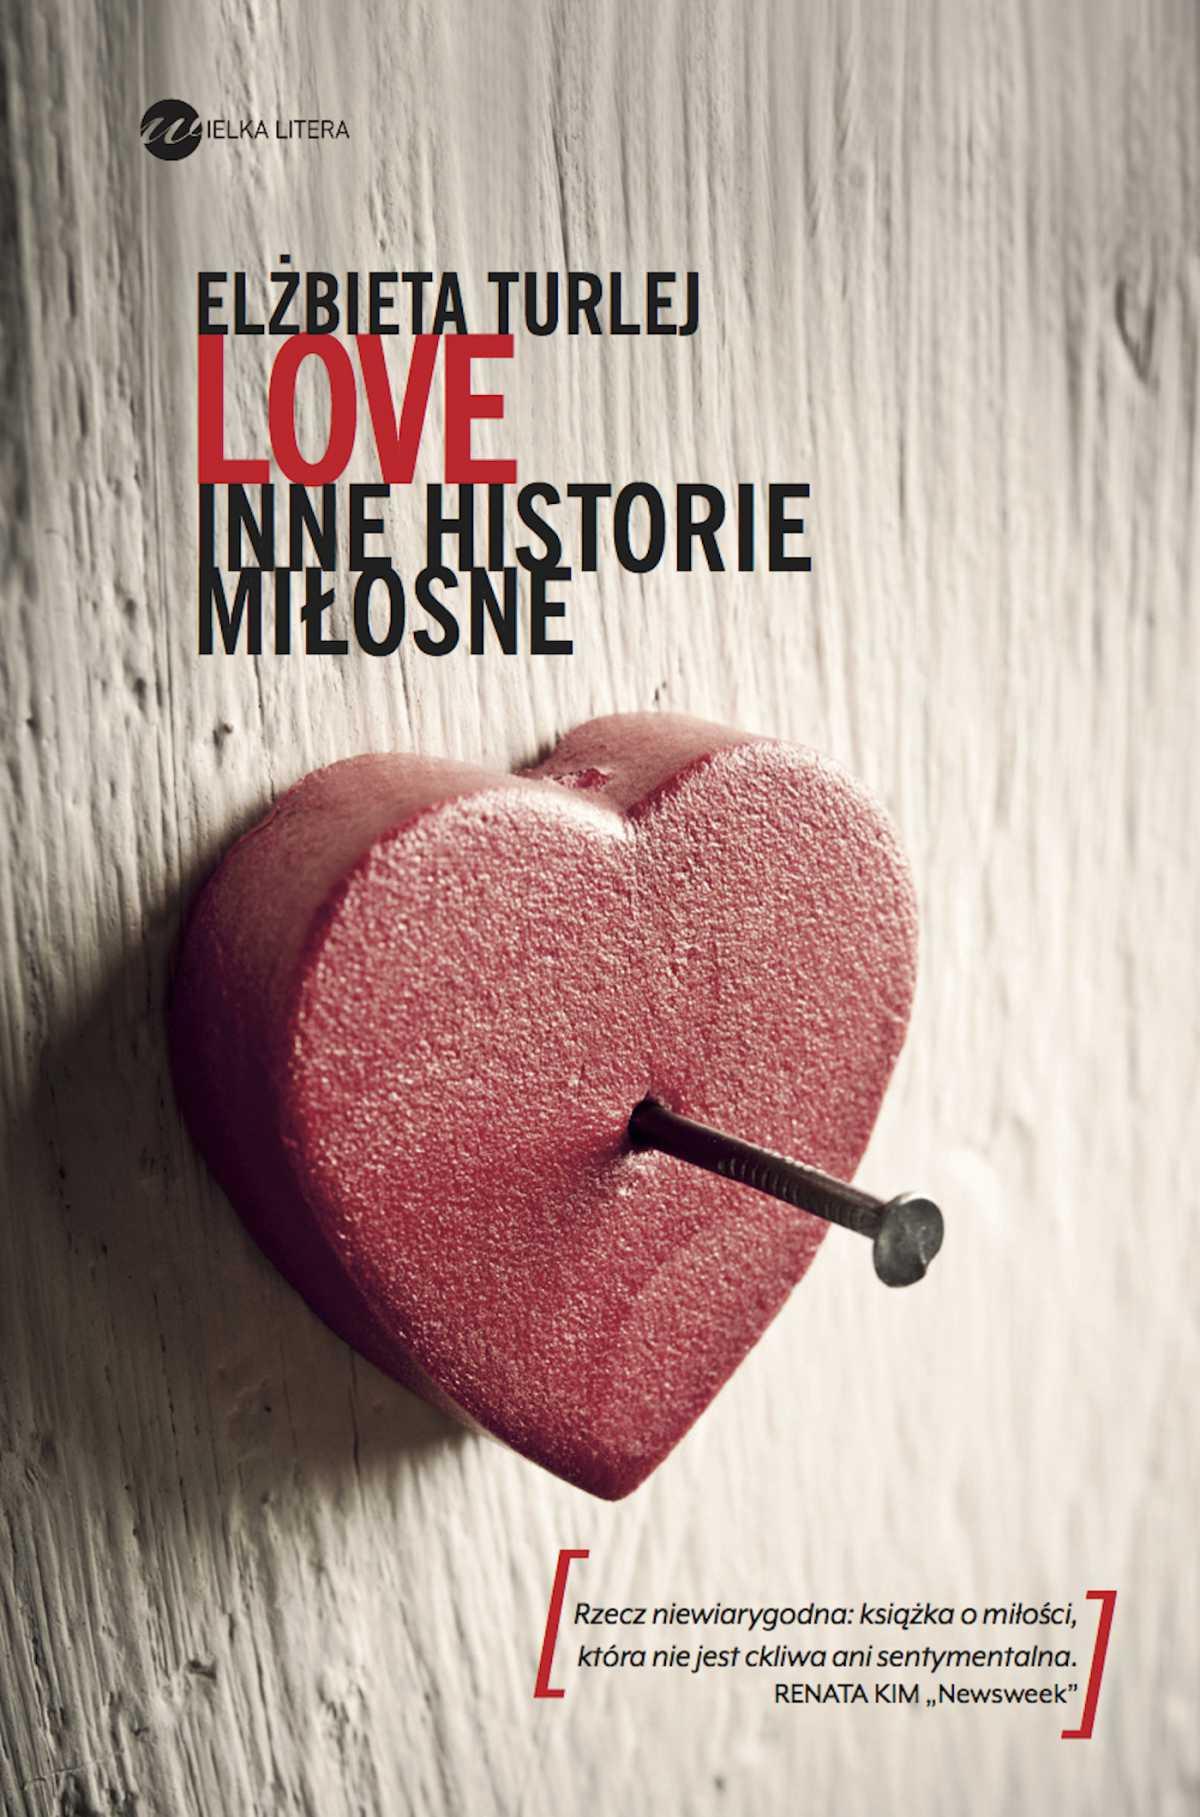 LOVE inne historie miłosne - Ebook (Książka EPUB) do pobrania w formacie EPUB